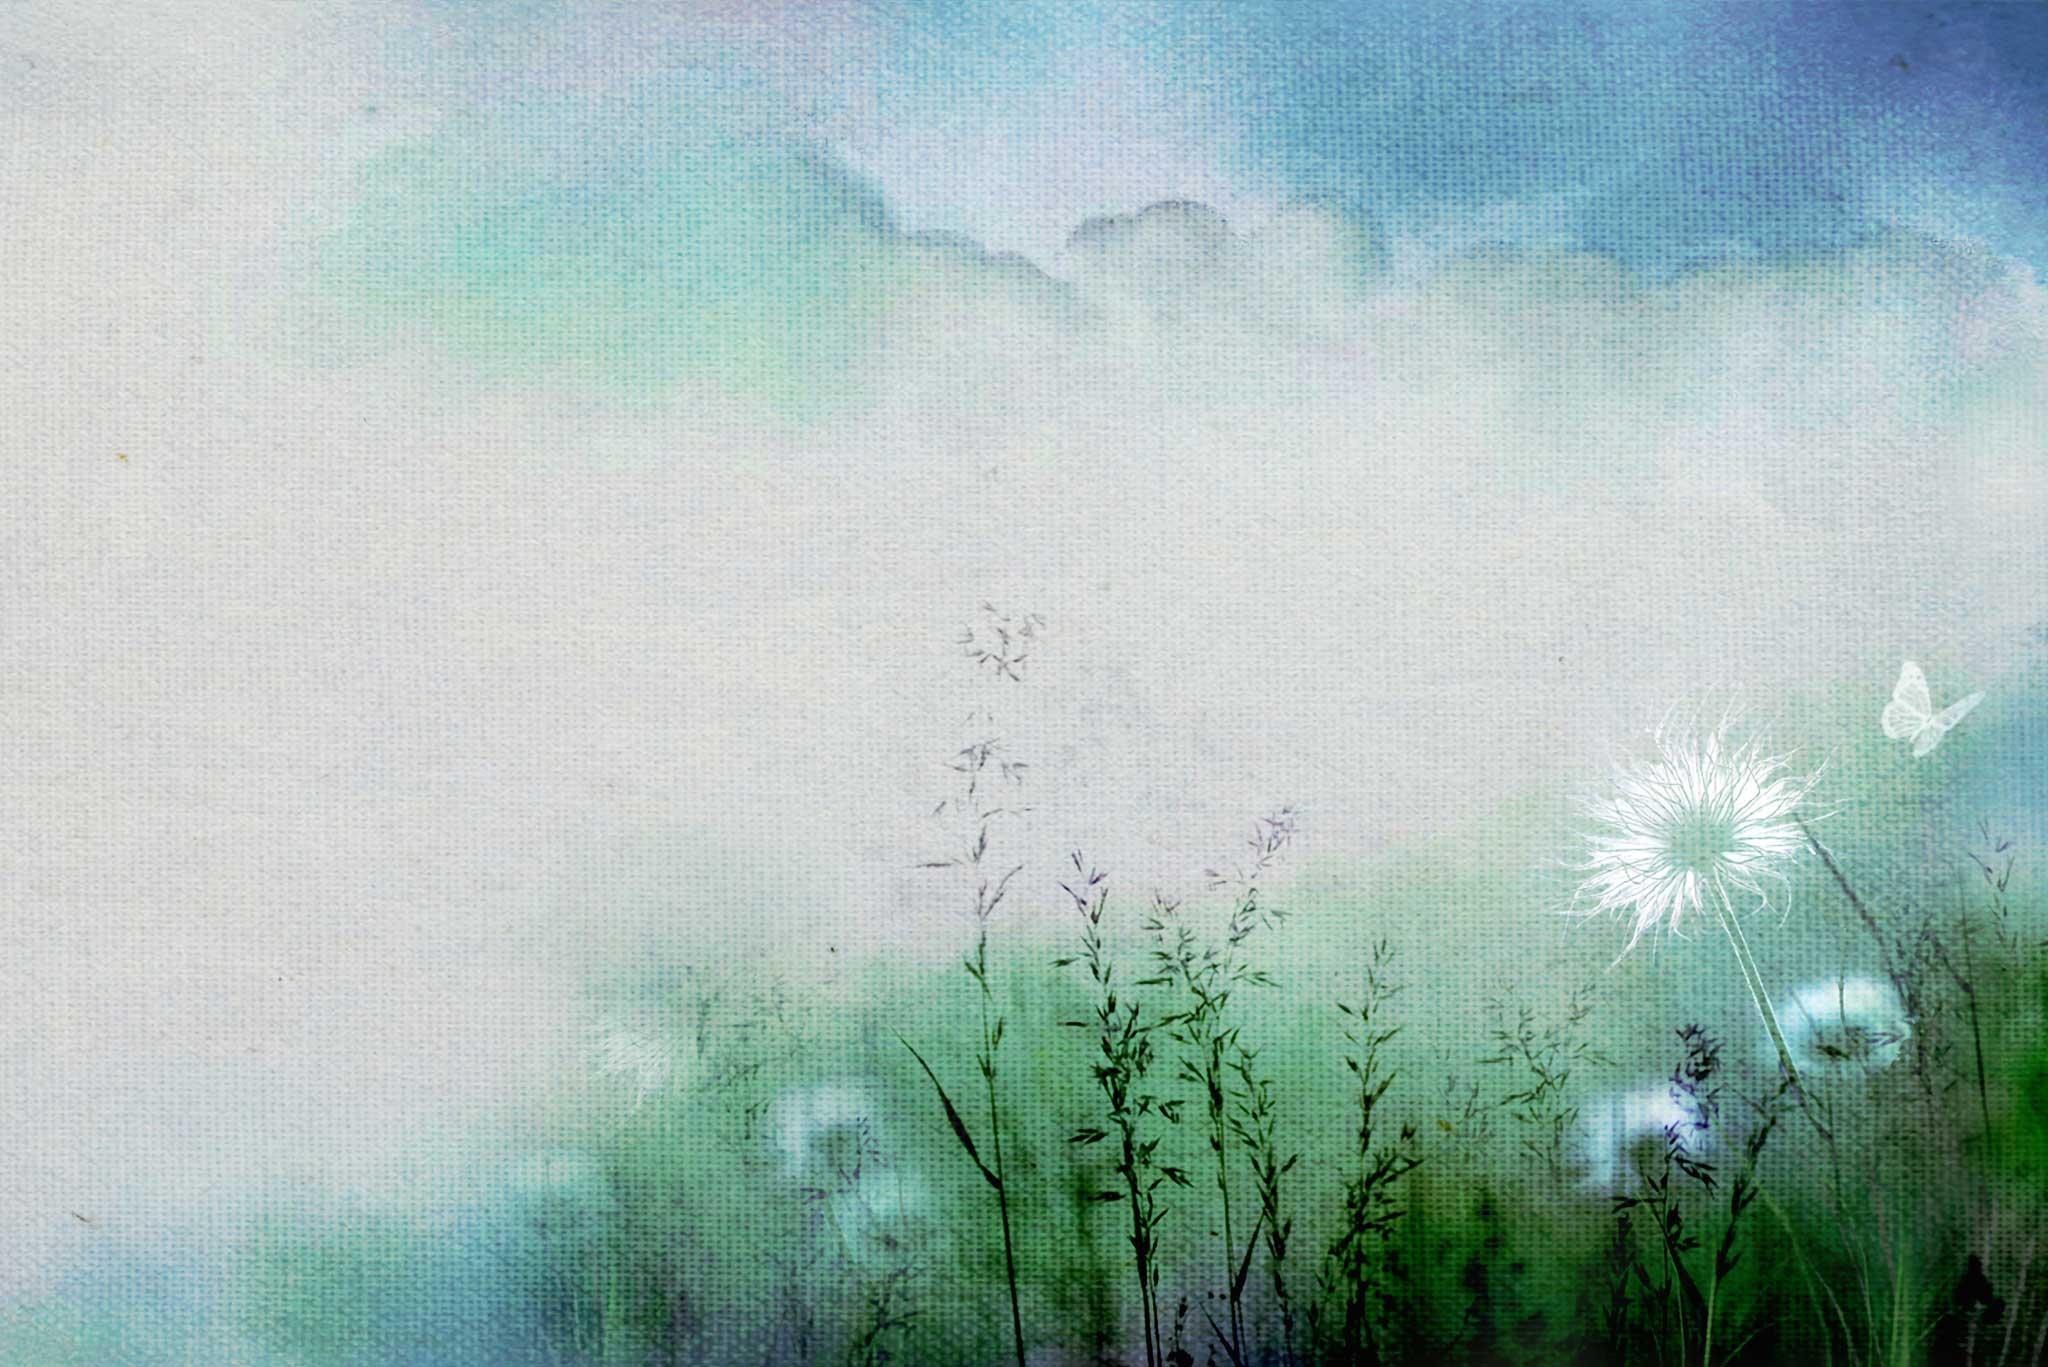 tapet-fototapet-design-decor-mural-customizabil-comanda-personalizat-bucuresti-daring-prints-motiv-model-desen-acuarela-pastel-bleu-verde-papadii-fluture-alb